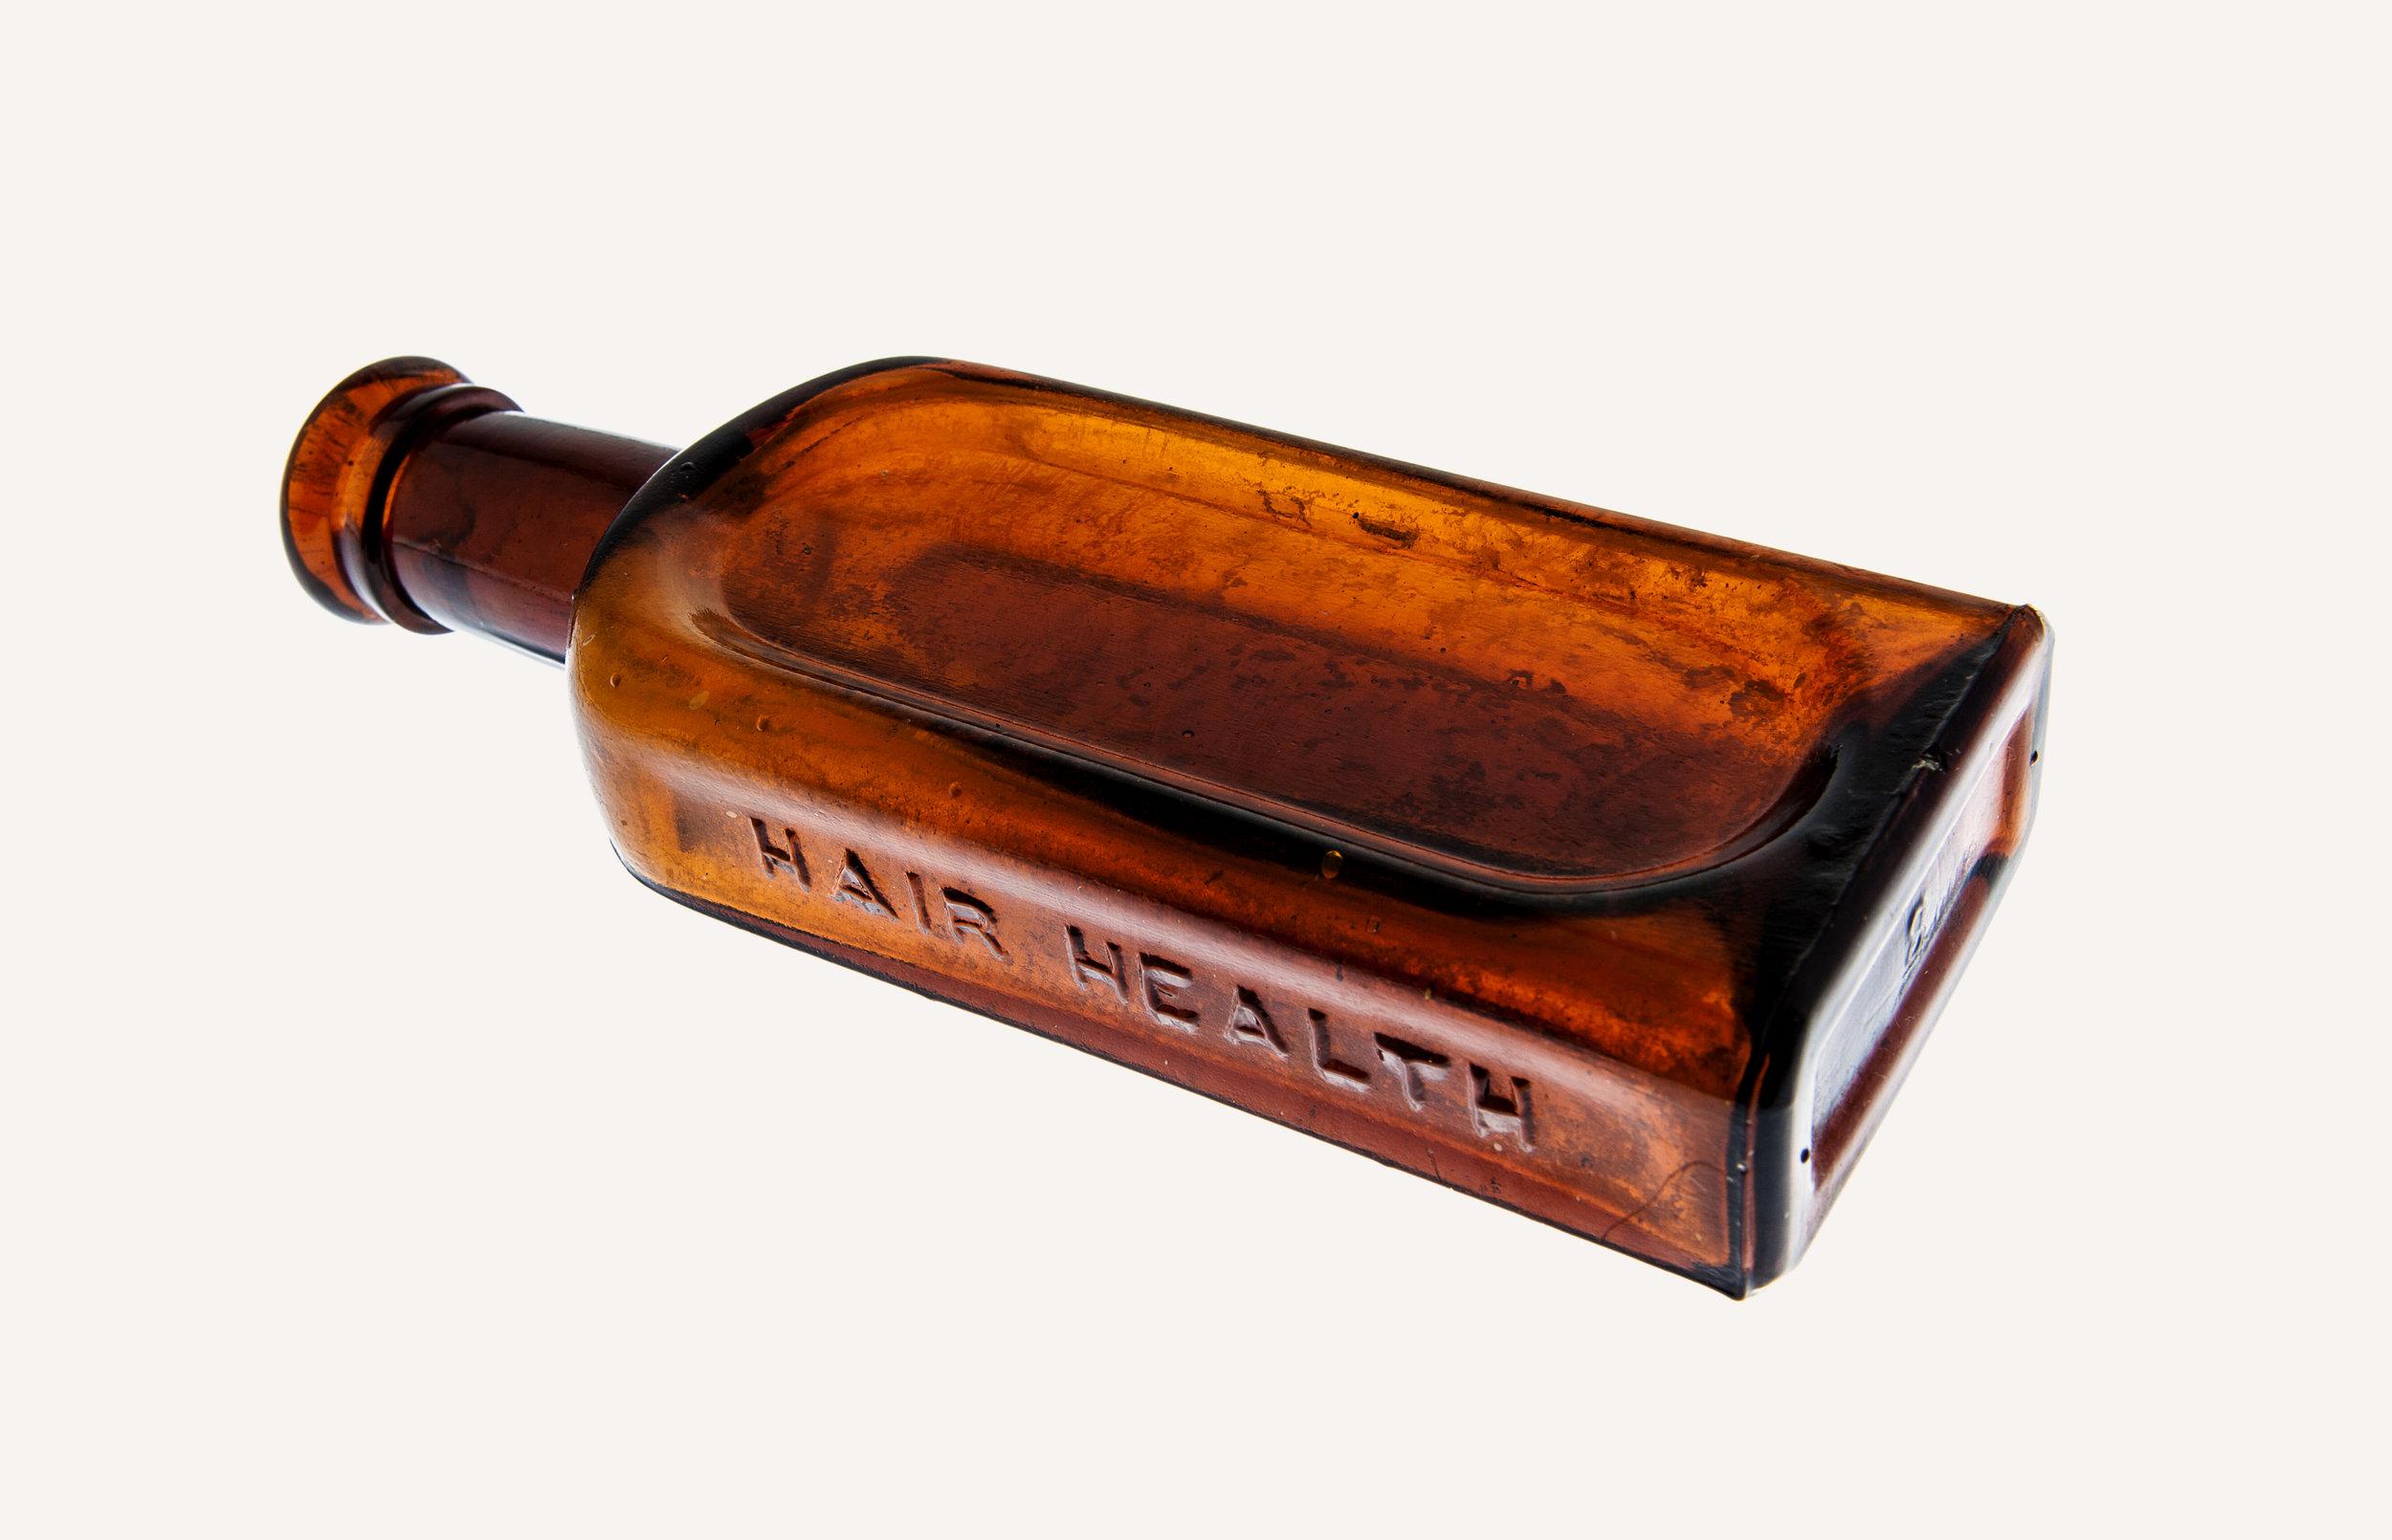 hair heath bottle.jpg